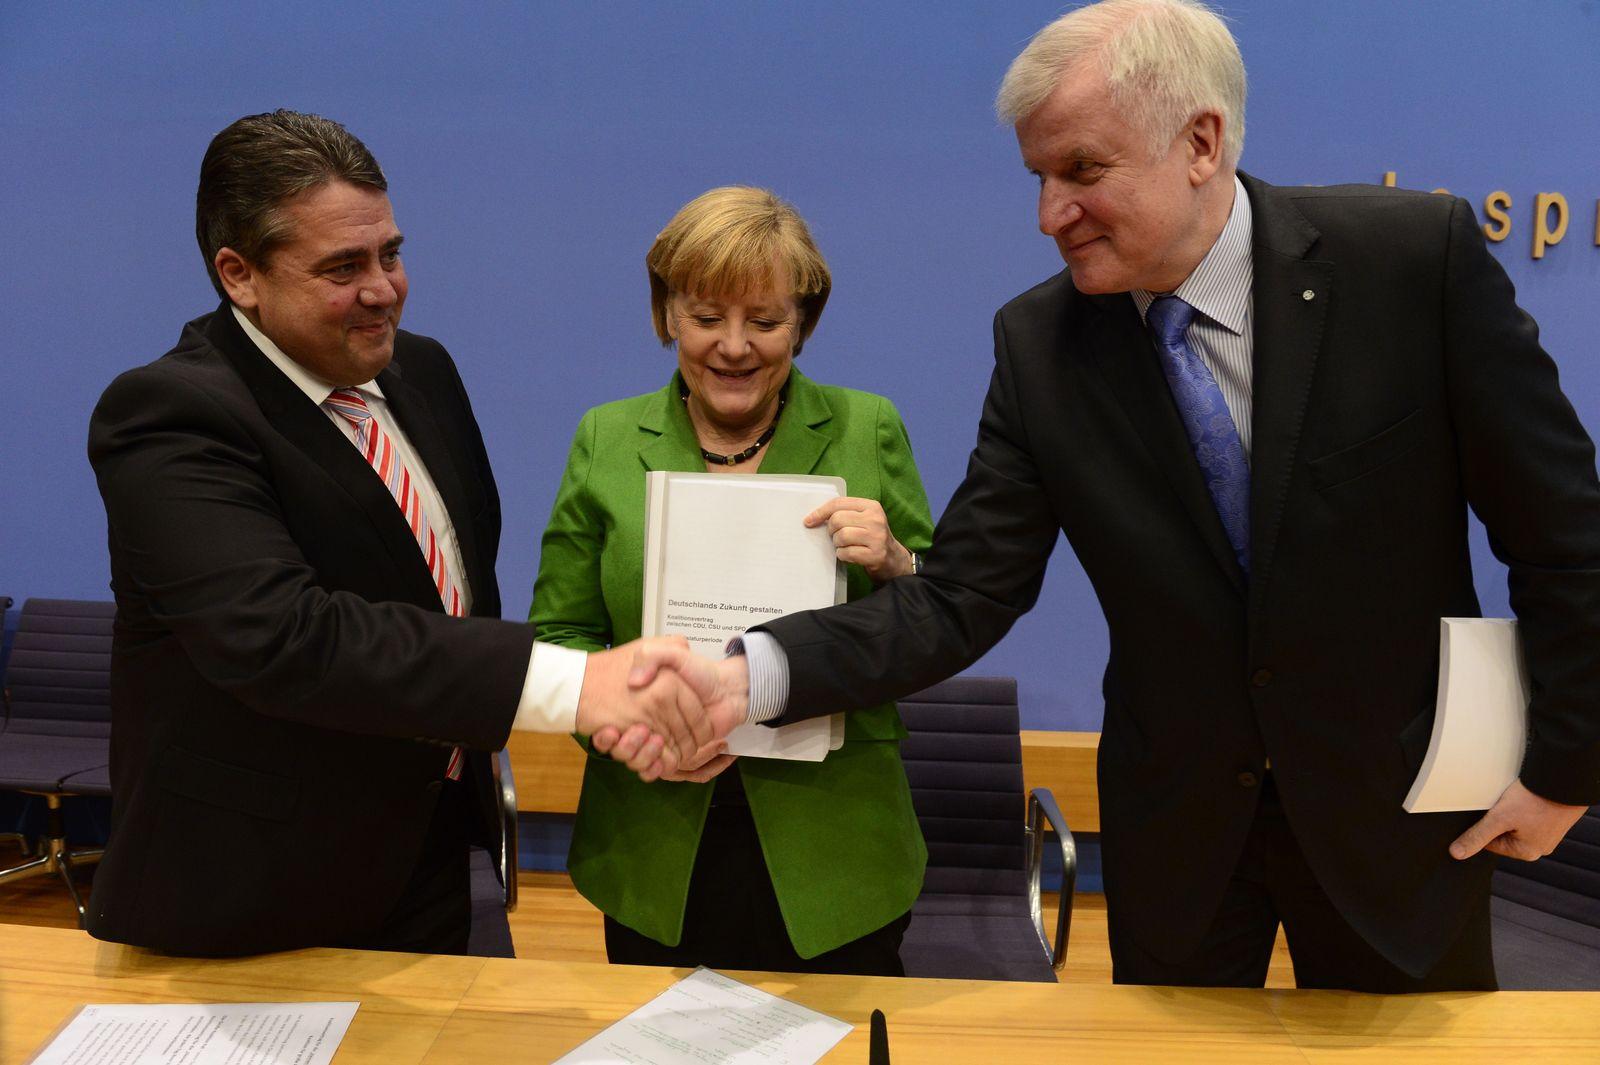 TOPSHOTS-GERMANY-POLITICS-COALITION